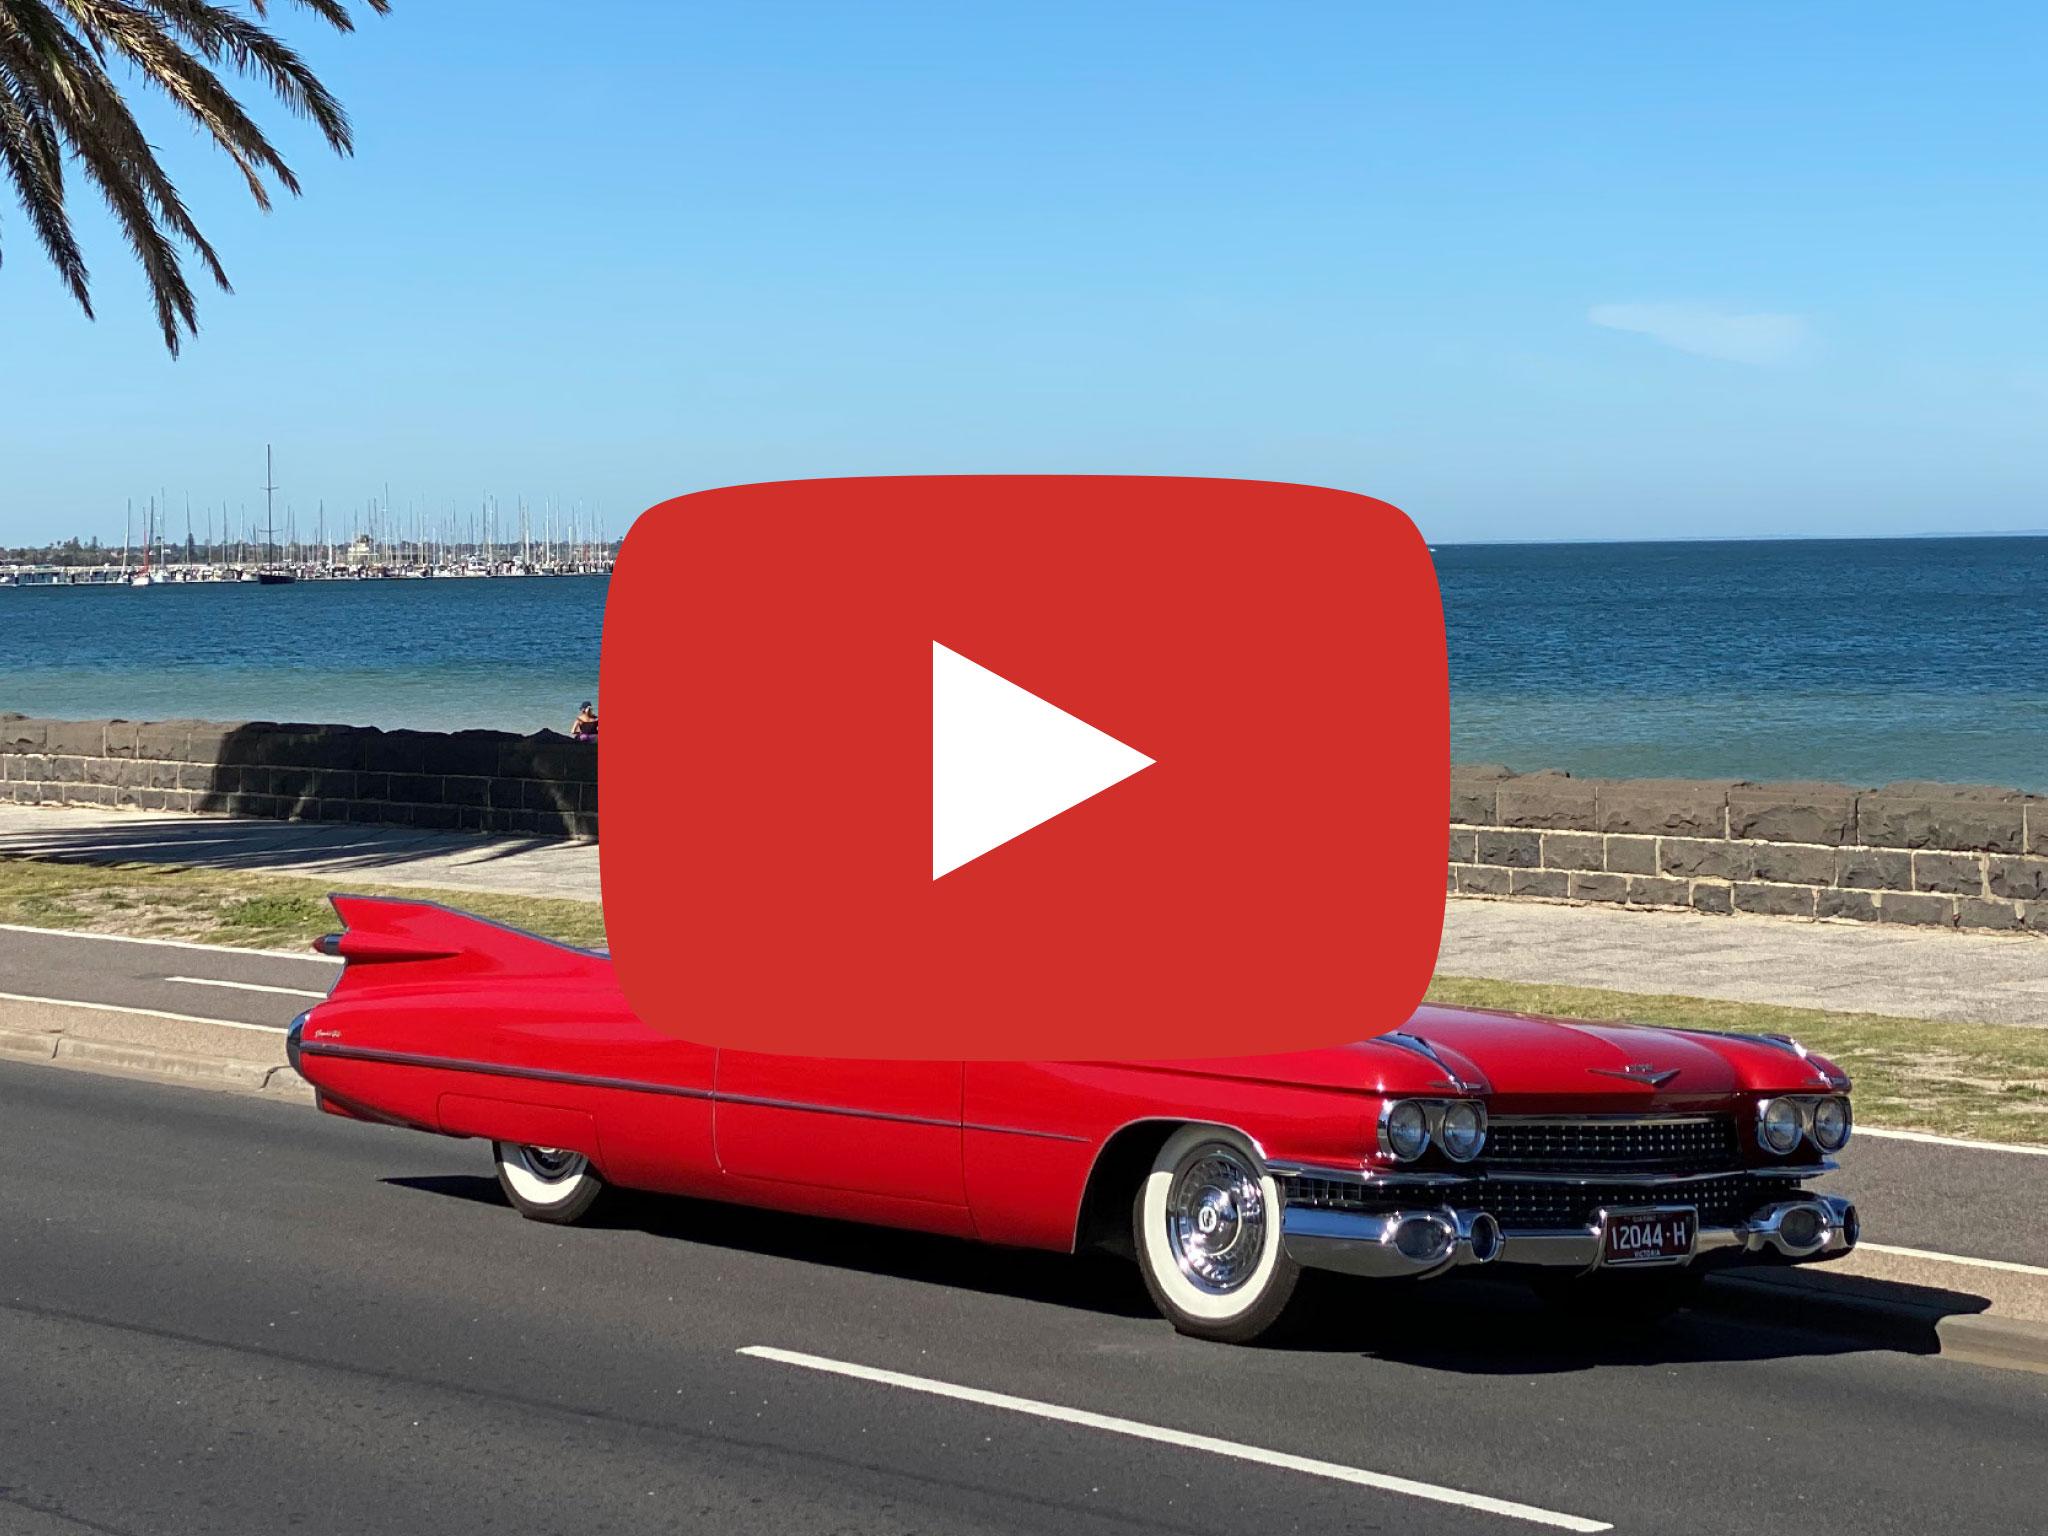 Cadillac Coupe de Ville (1959 Model), at Port Melbourne VIC, Video taken by Ralf Boetker March 2020